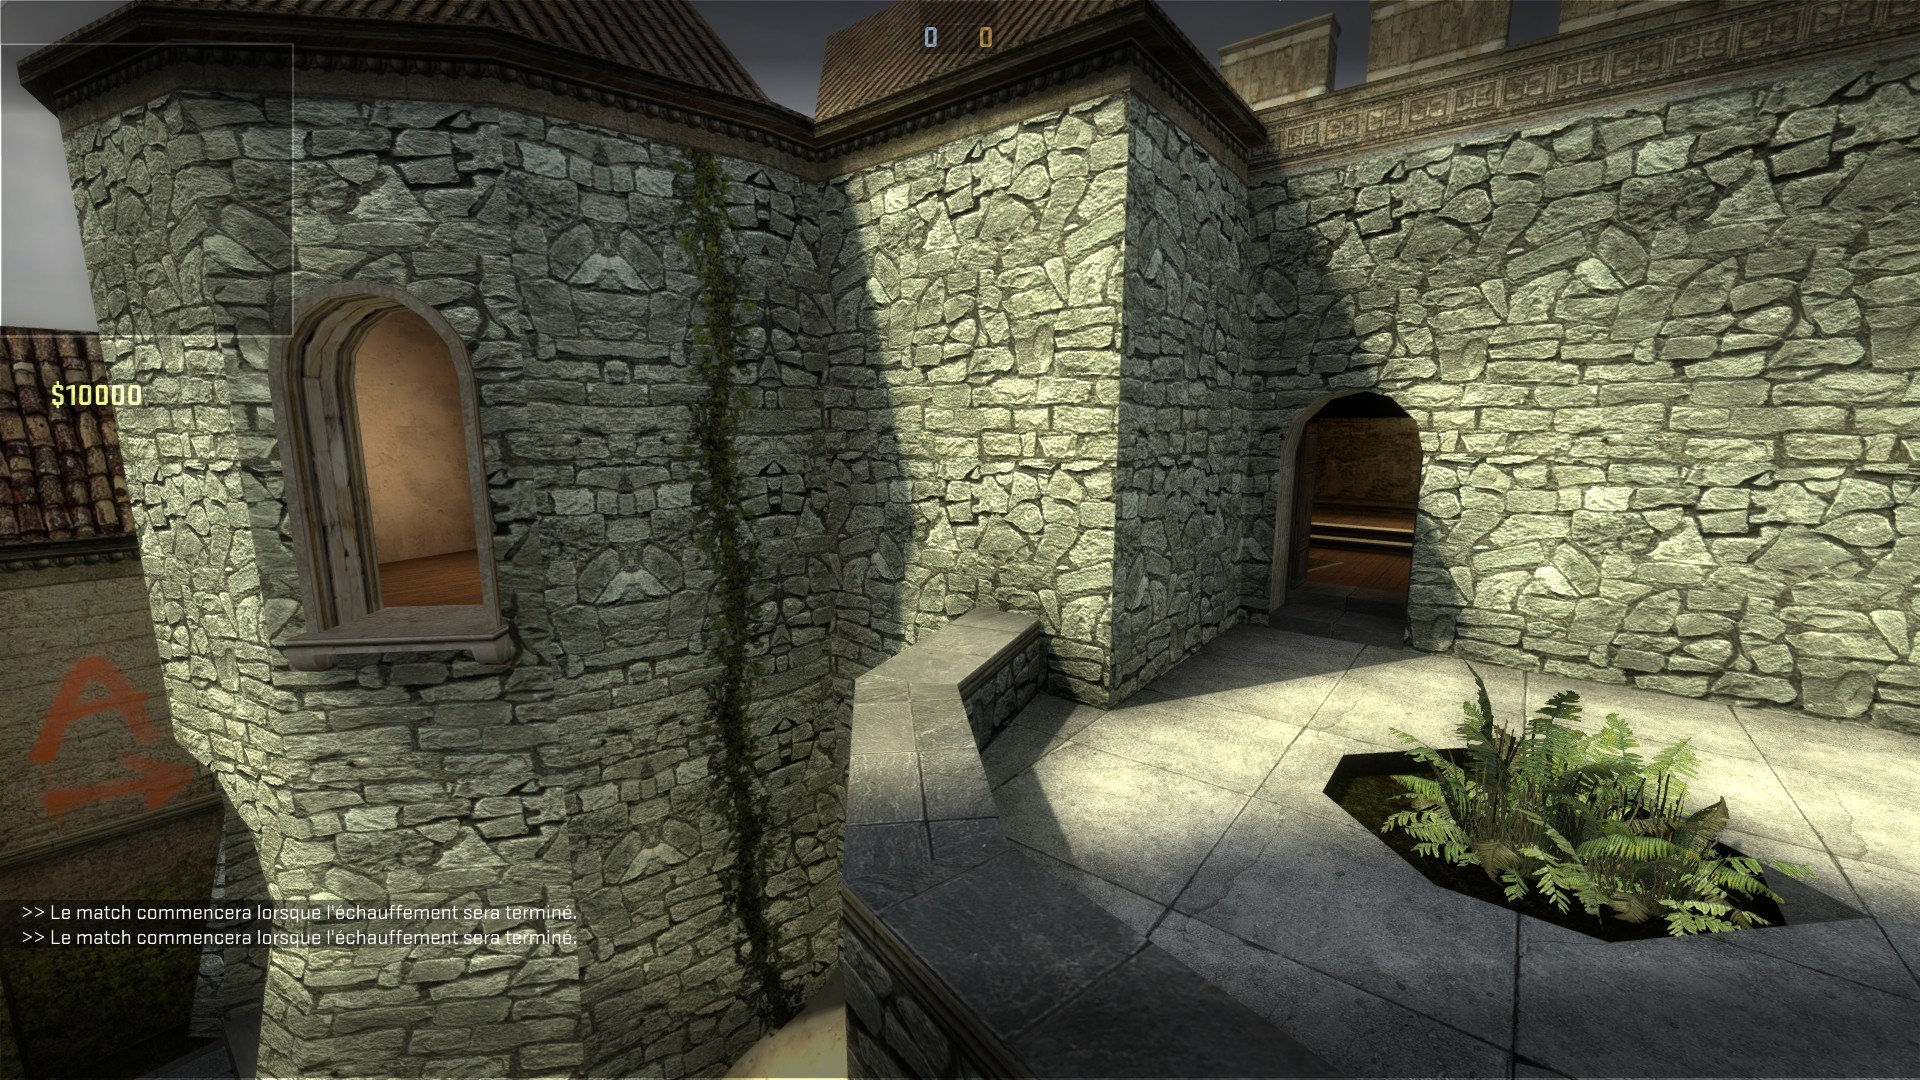 http://files.gamebanana.com/img/ss/wips/51cf33b7e1aa2.jpg